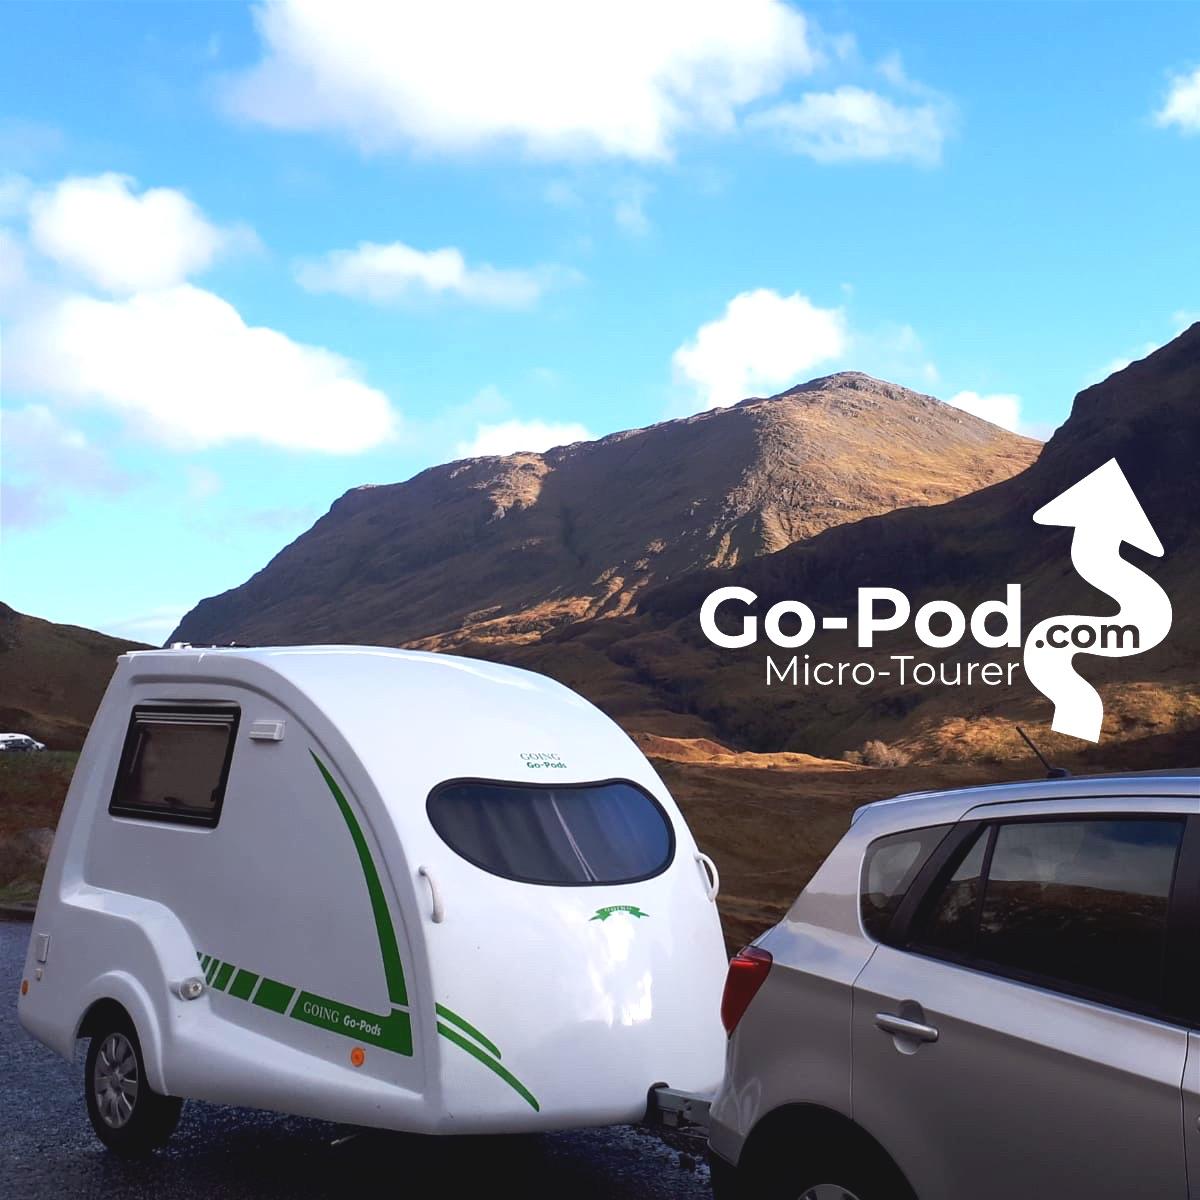 Go-Pod.com Glencoe Scotand square